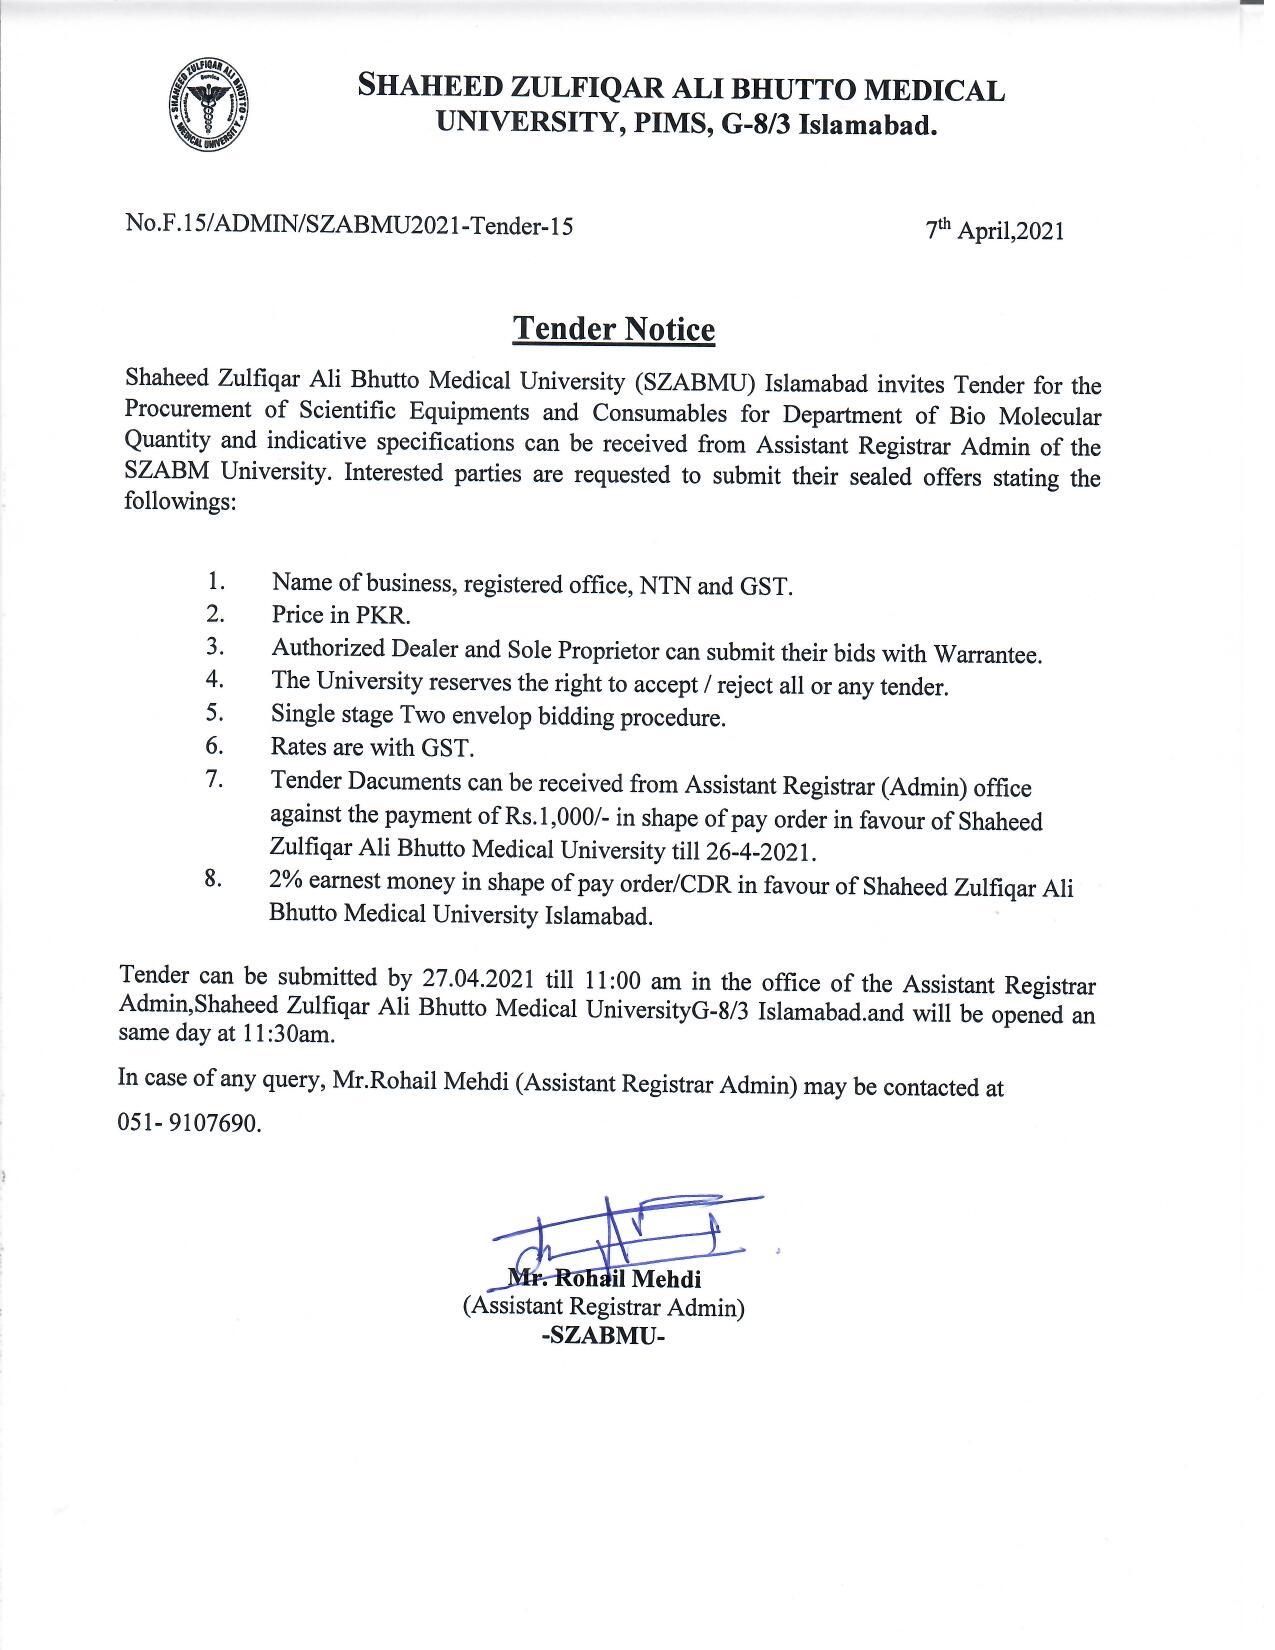 Tender Notice for procurement of scientific equipment